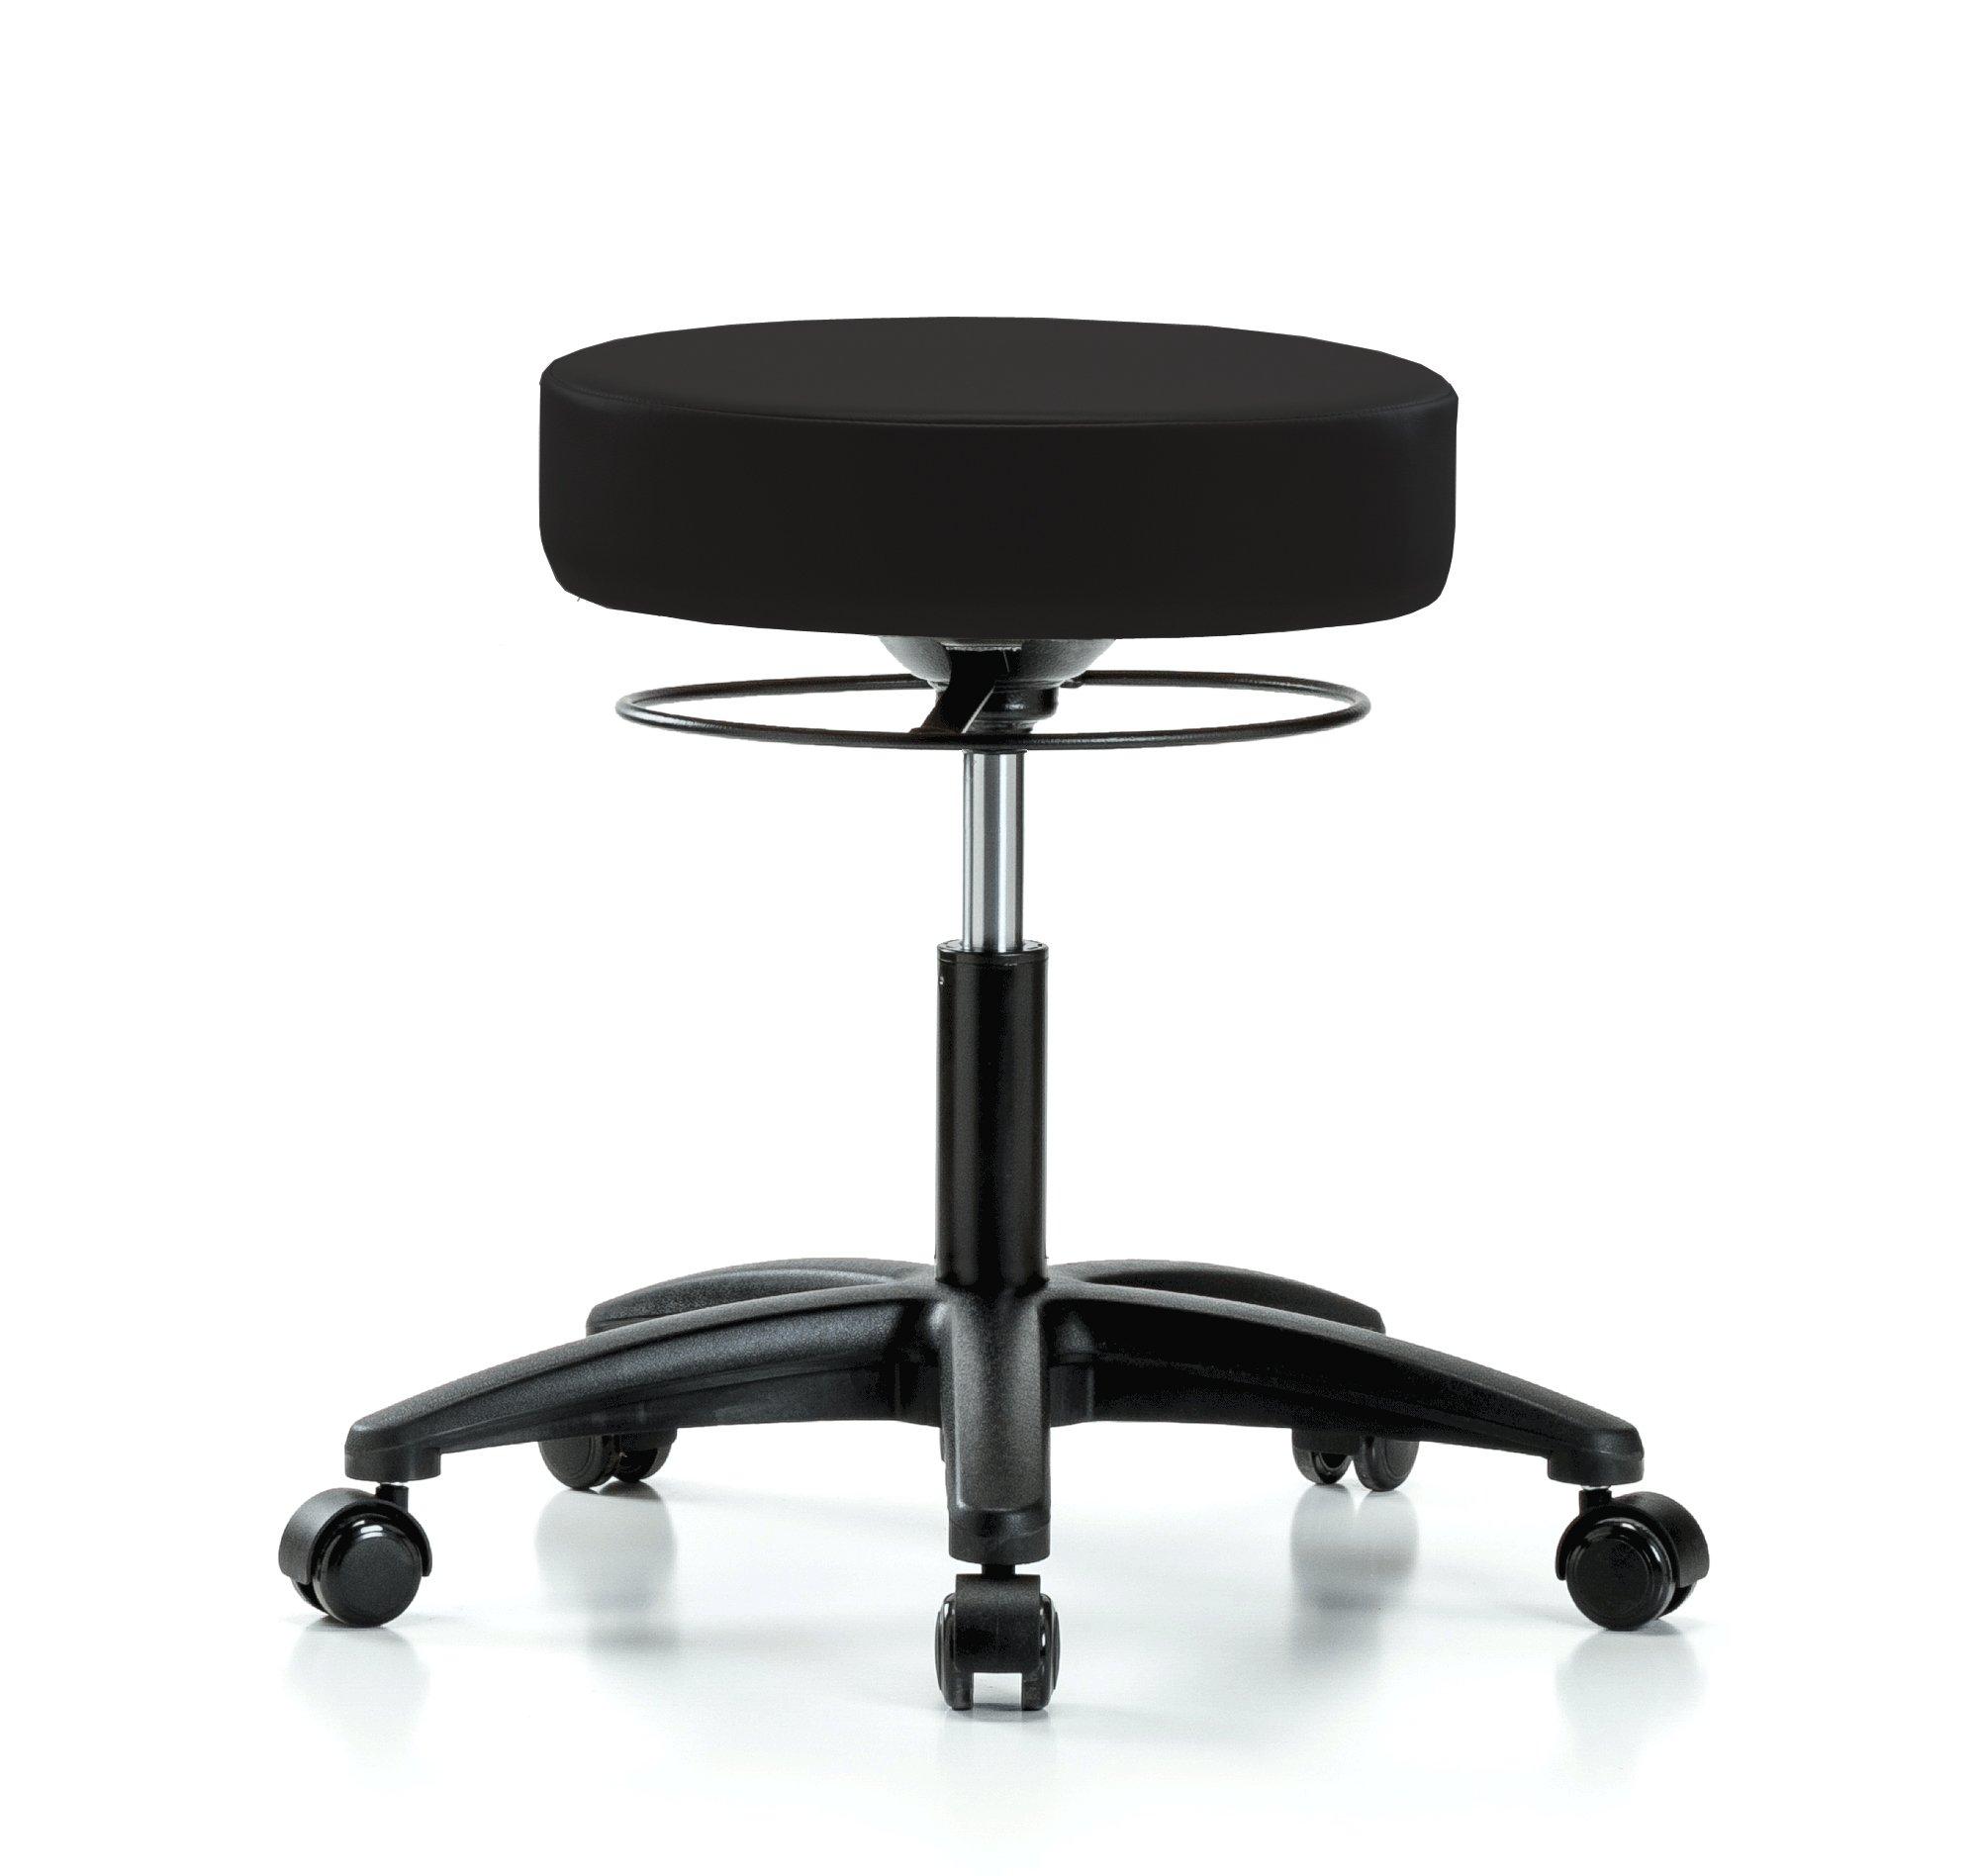 Perch Stella Rolling Adjustable Stool Medical Salon Spa Massage Tattoo Office 18.5'' - 24'' (Hard Floor Casters/Black Vinyl)